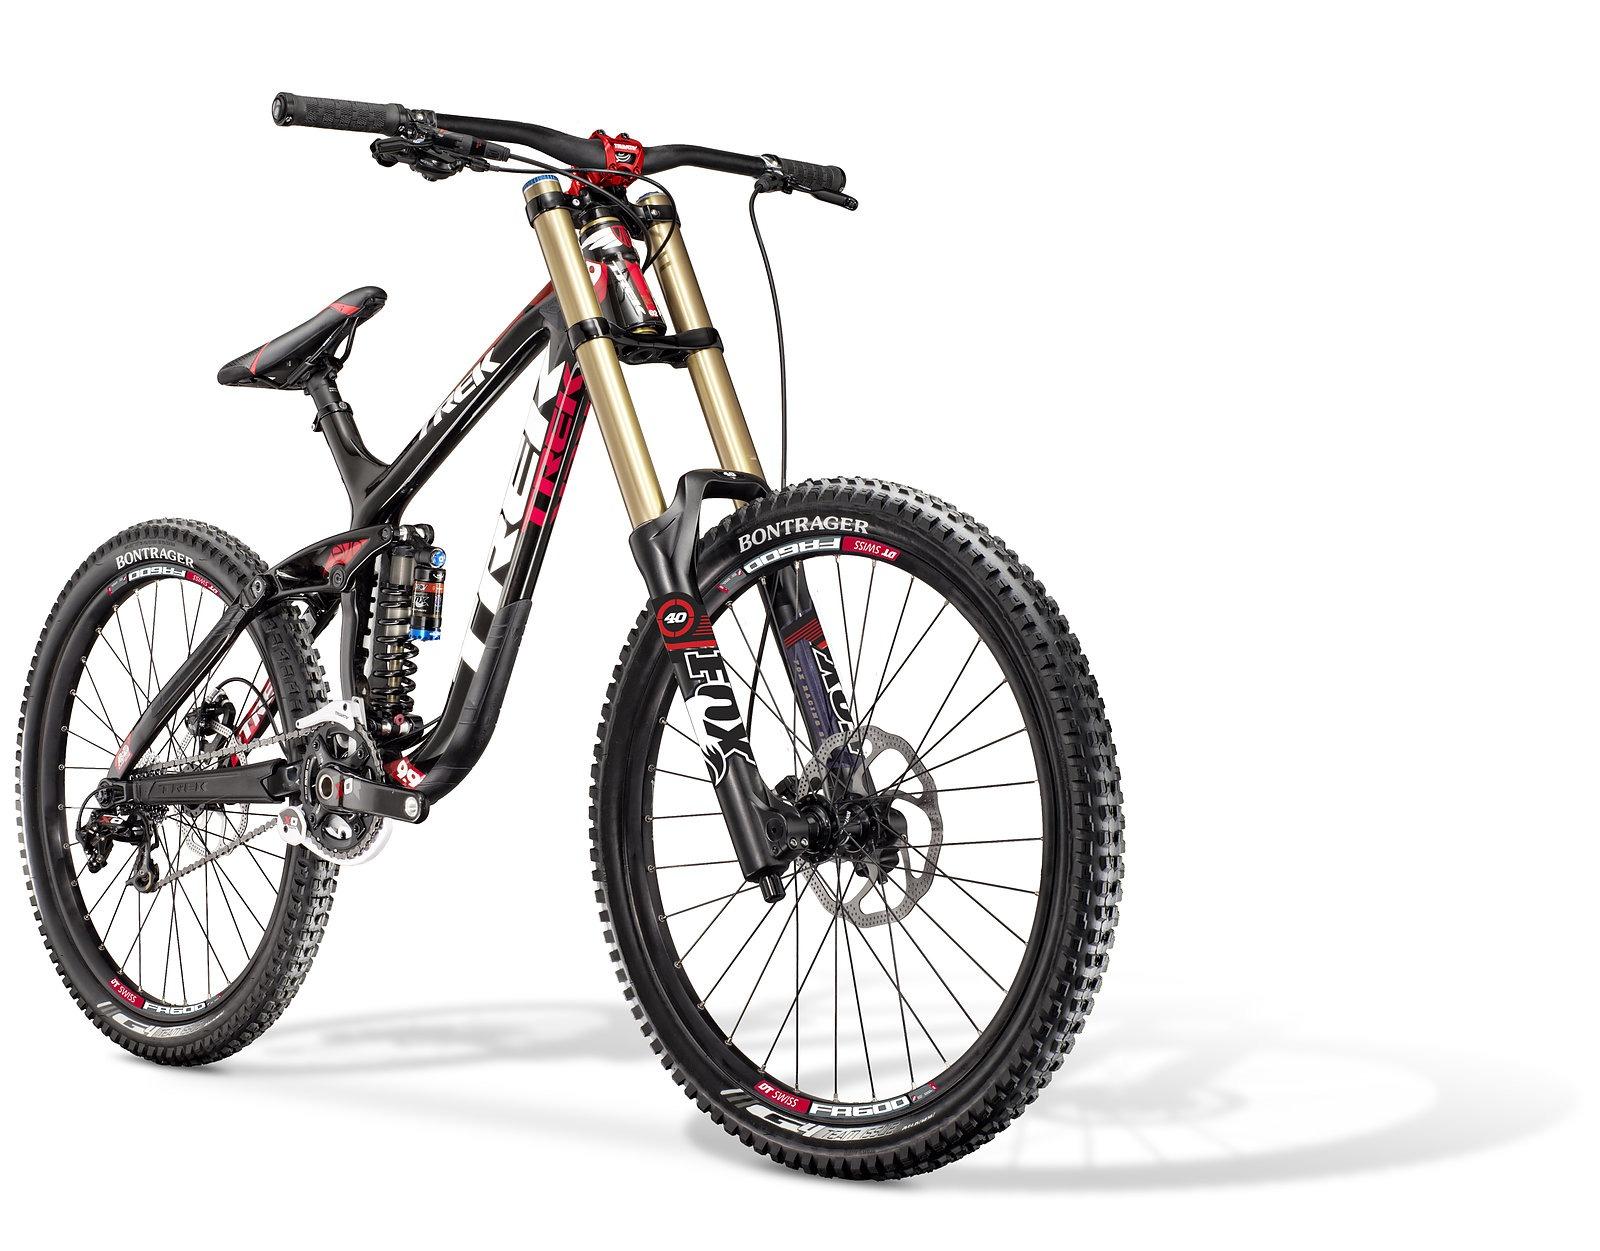 92fcca0fb73 World's lightest DH bike - Trek Unveils 2012 Line of Full Suspension ...